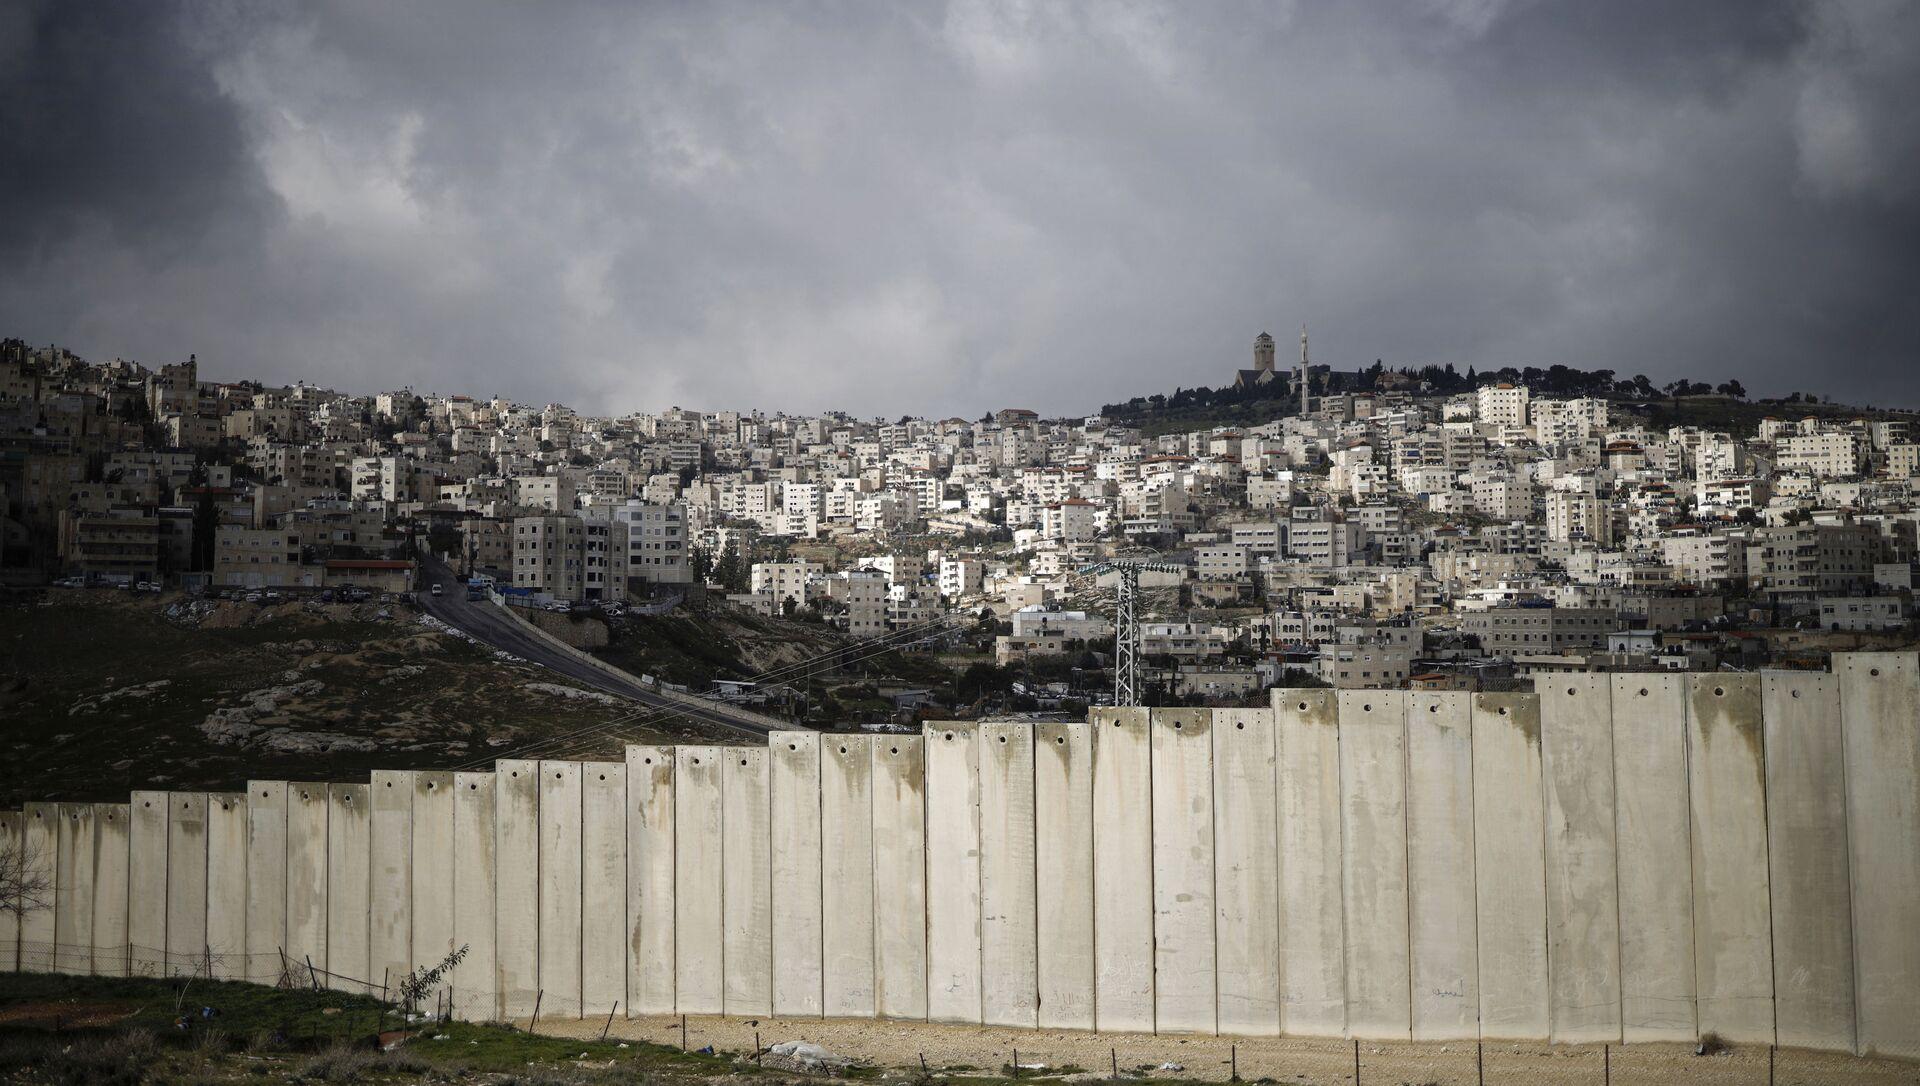 La barriera tra Palestina a Gerusalemme - Sputnik Italia, 1920, 13.05.2021